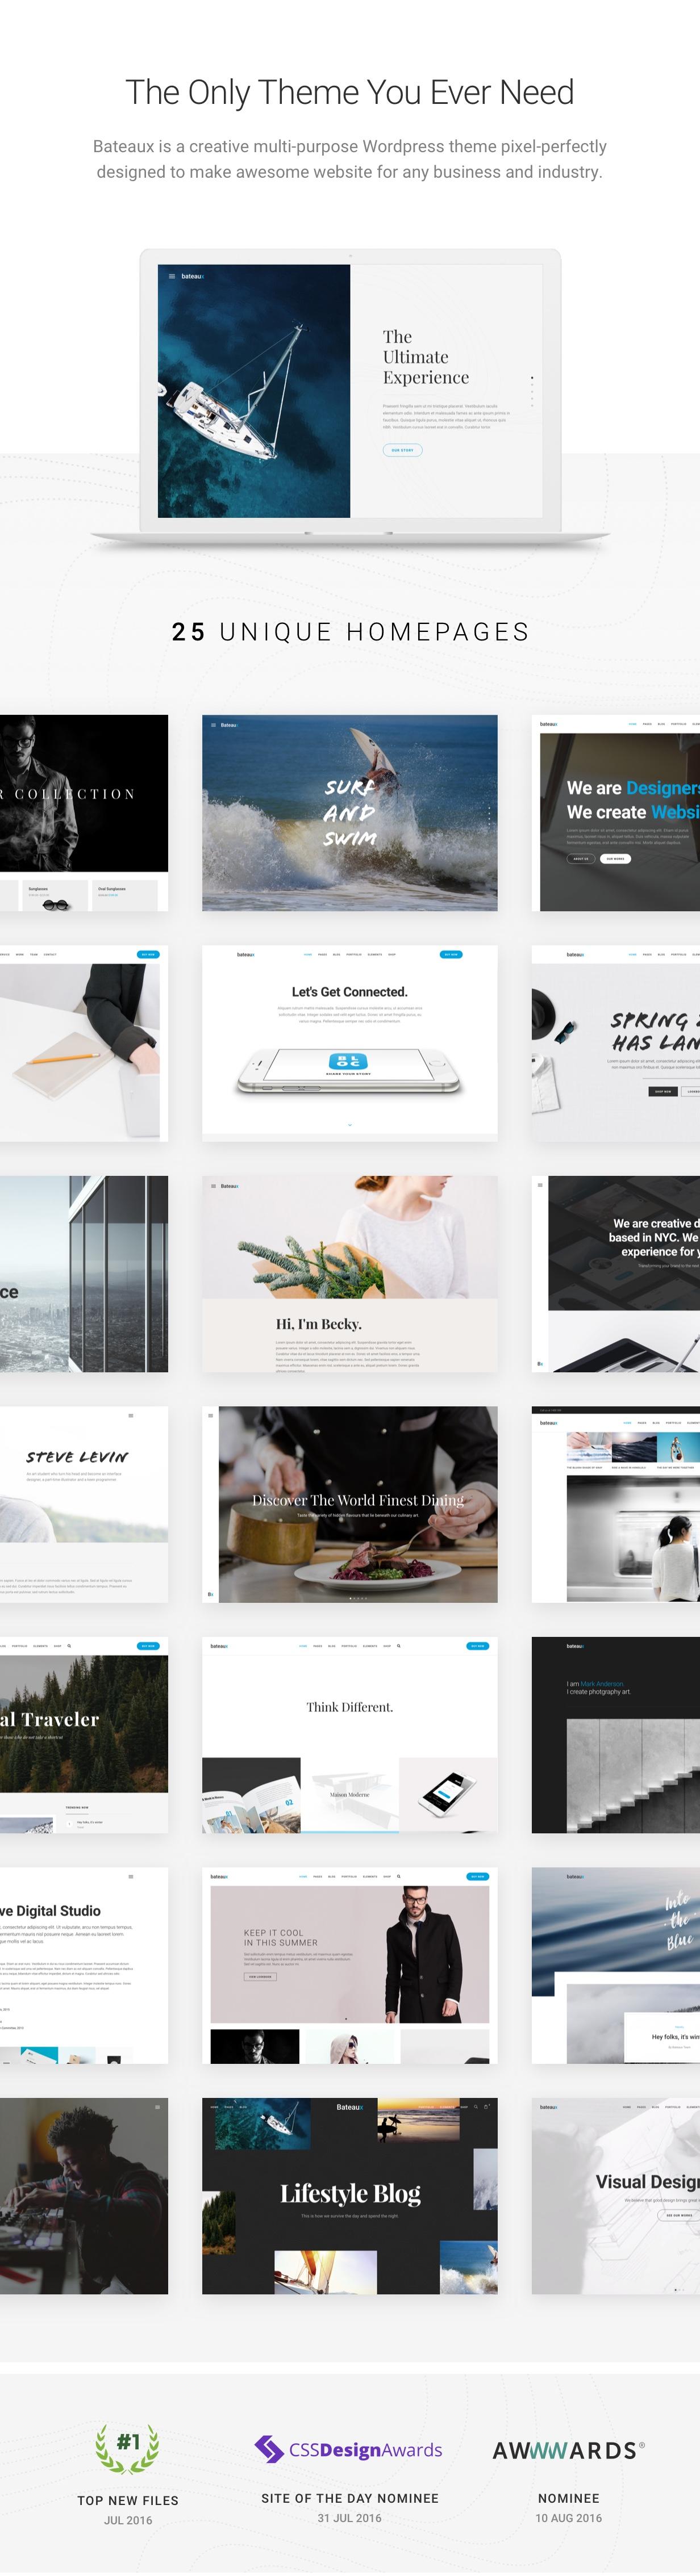 demo v1.3 - Bateaux - Creative Multi-Purpose WordPress Theme